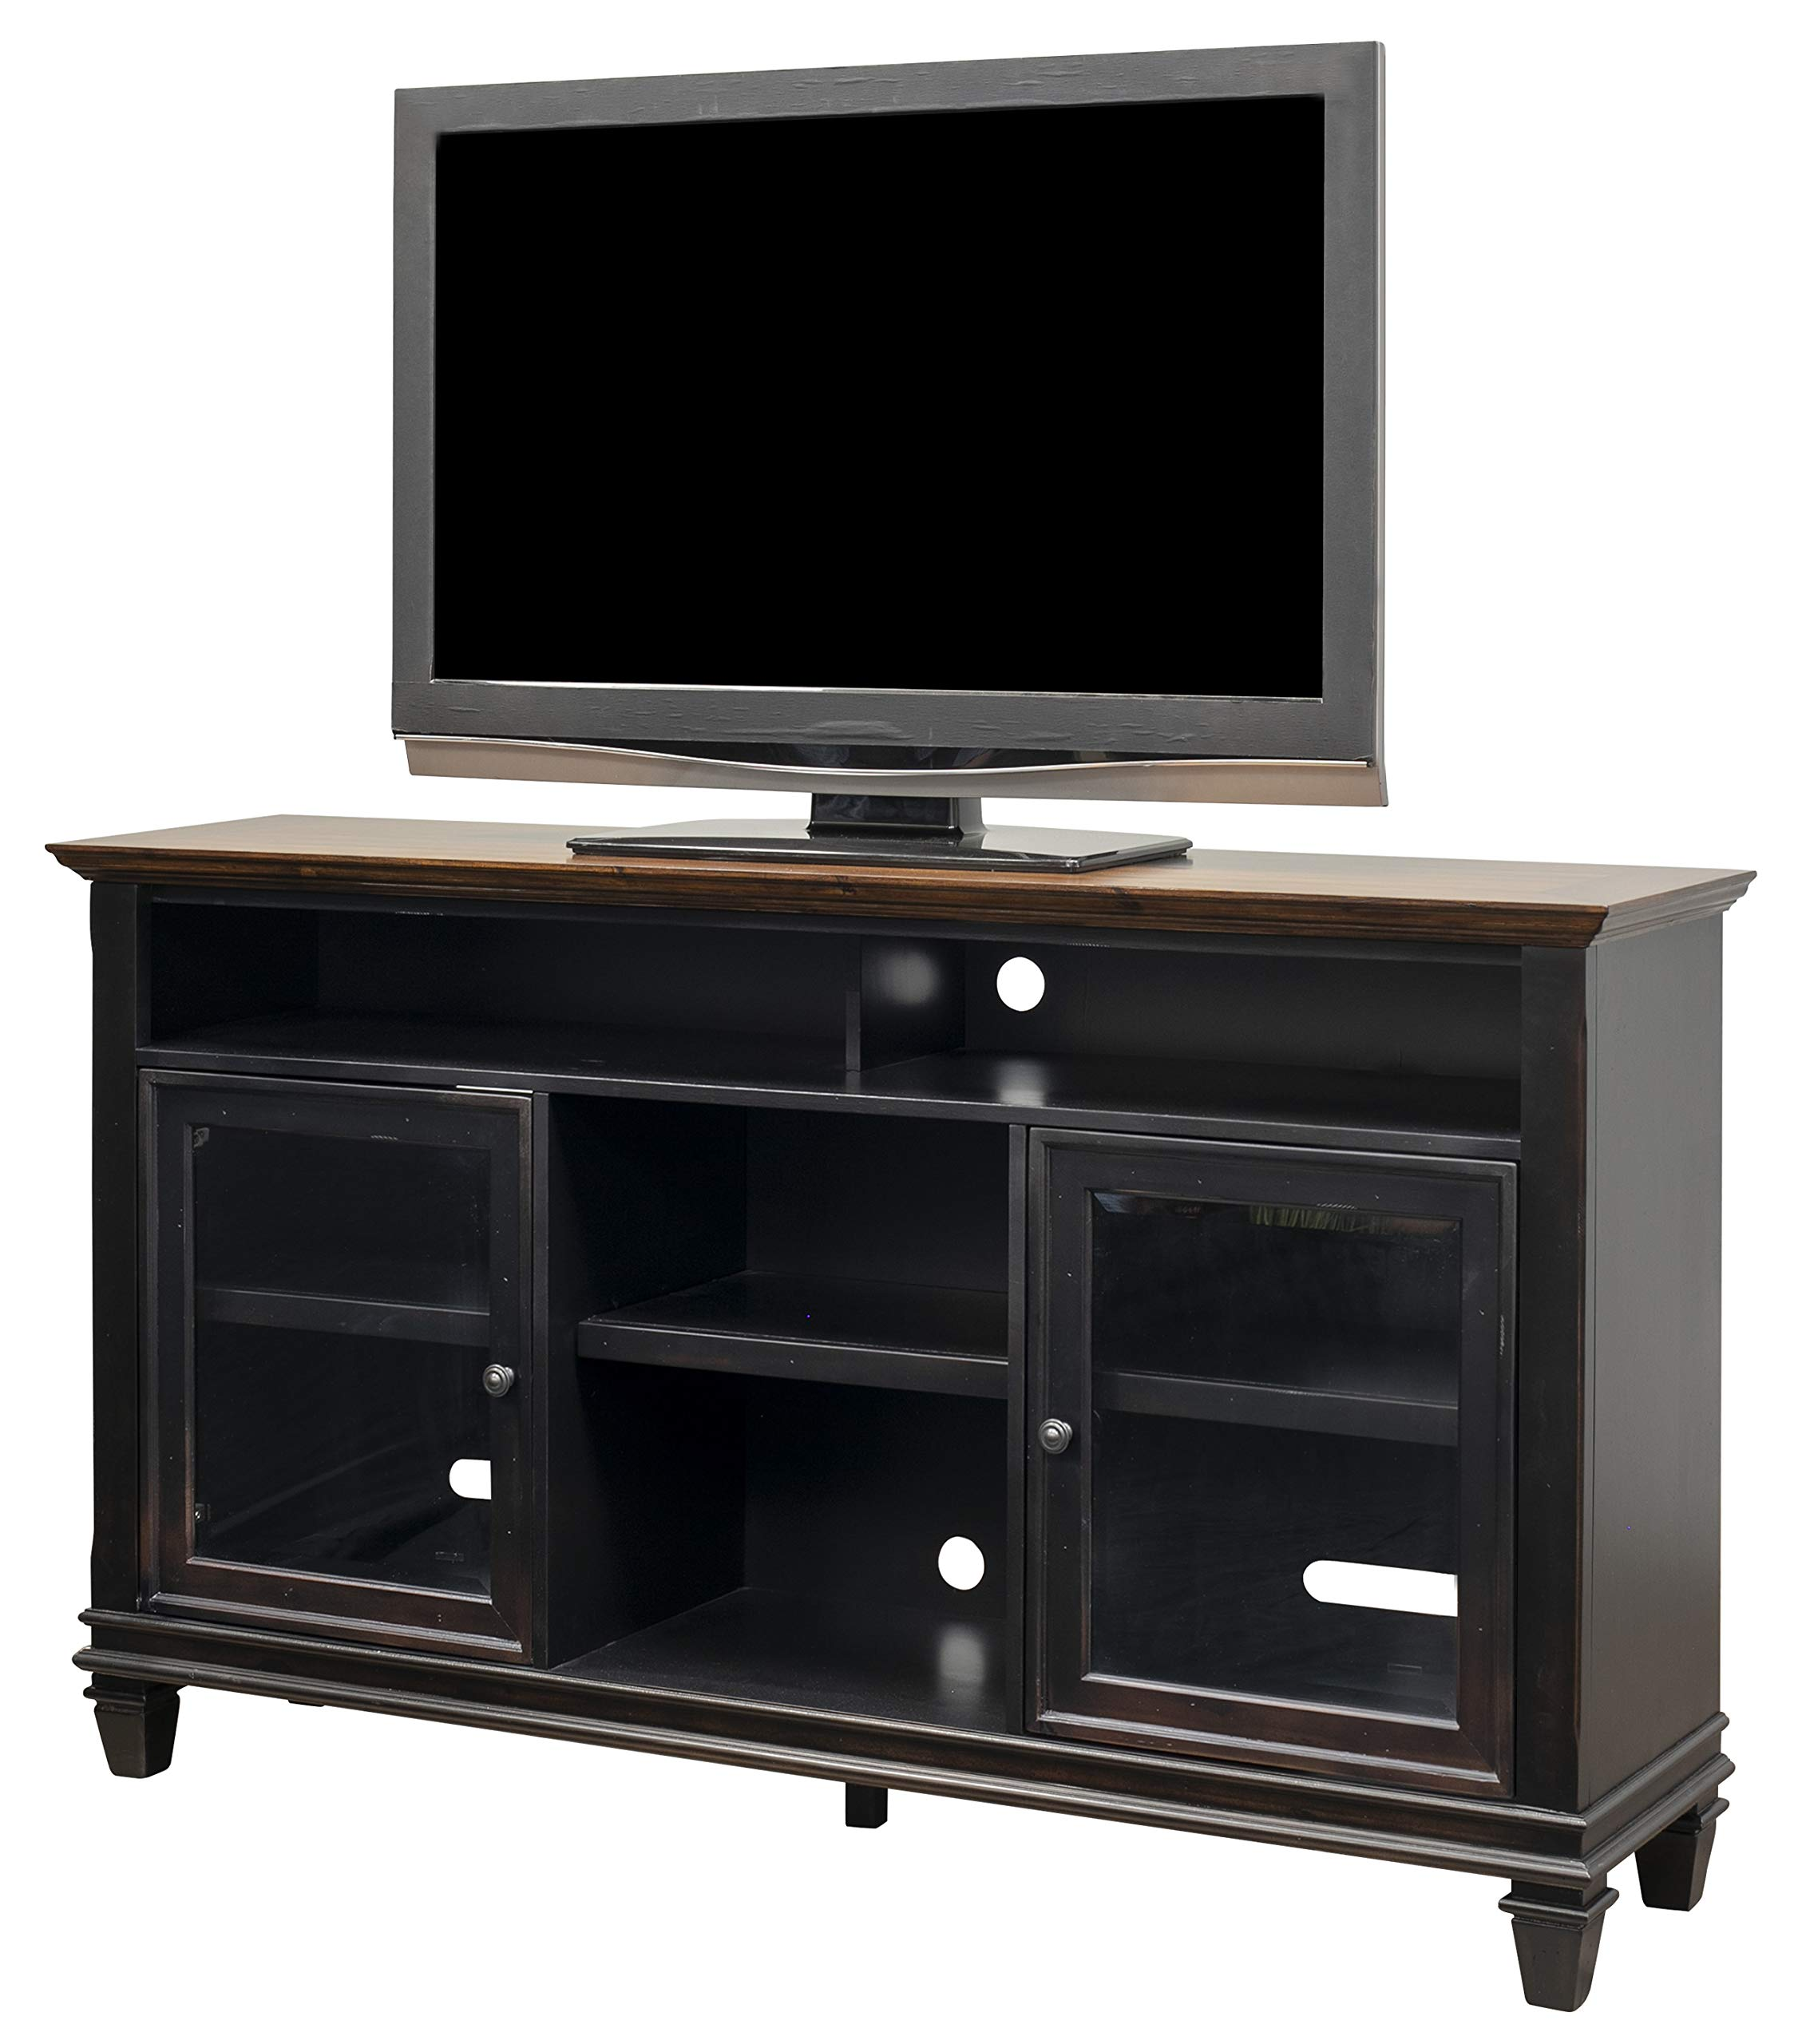 Grenen Tv Kast White Wash.Amazon Com Mecor Modern White Tv Stand With Led Lights High